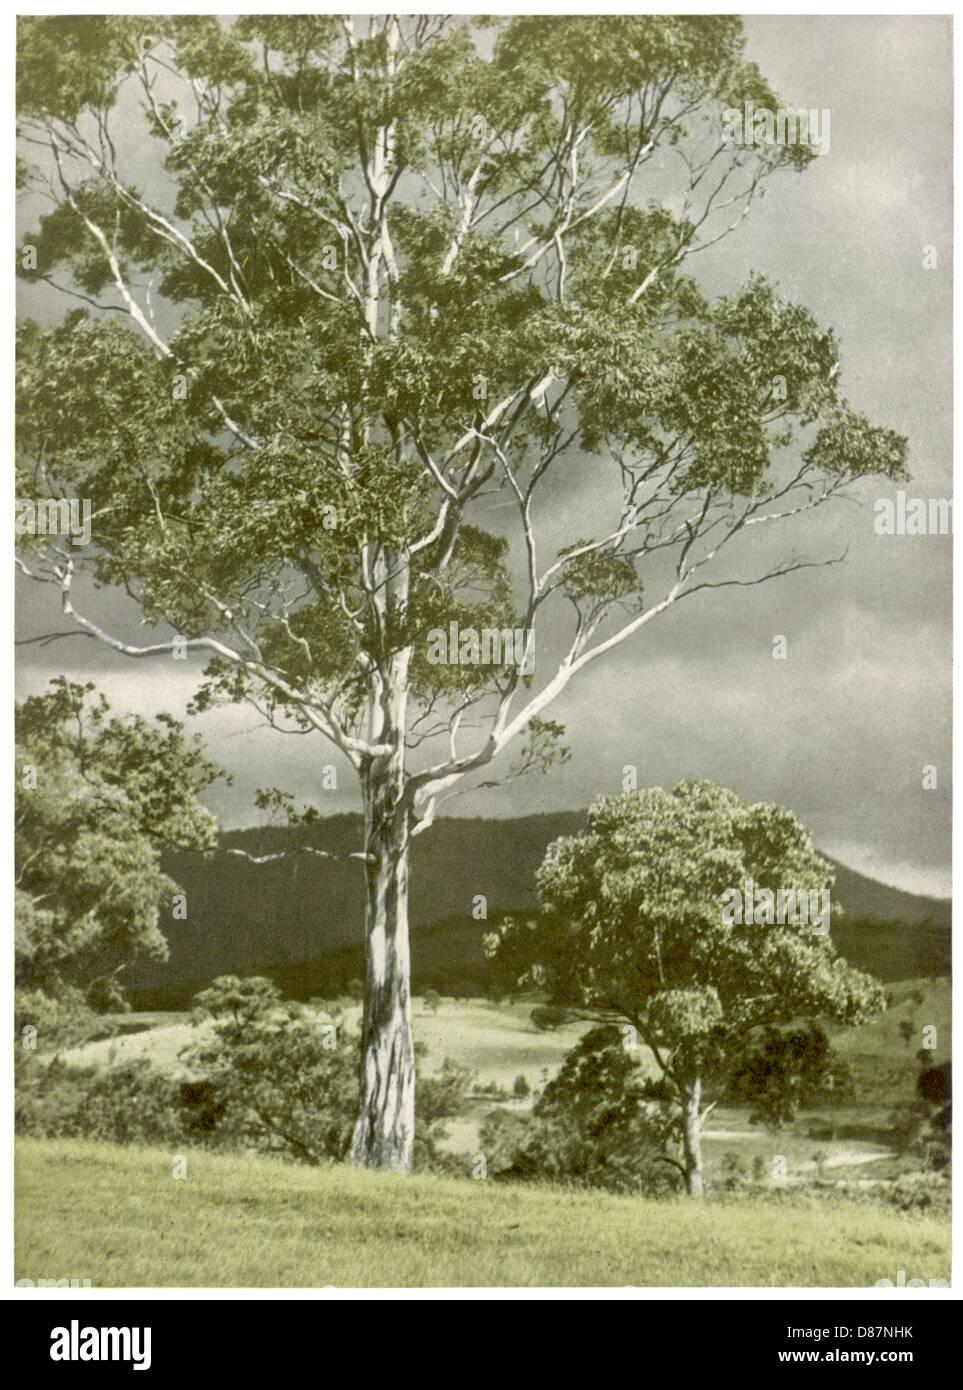 Trees Eucalyptus Regnans - Stock Image